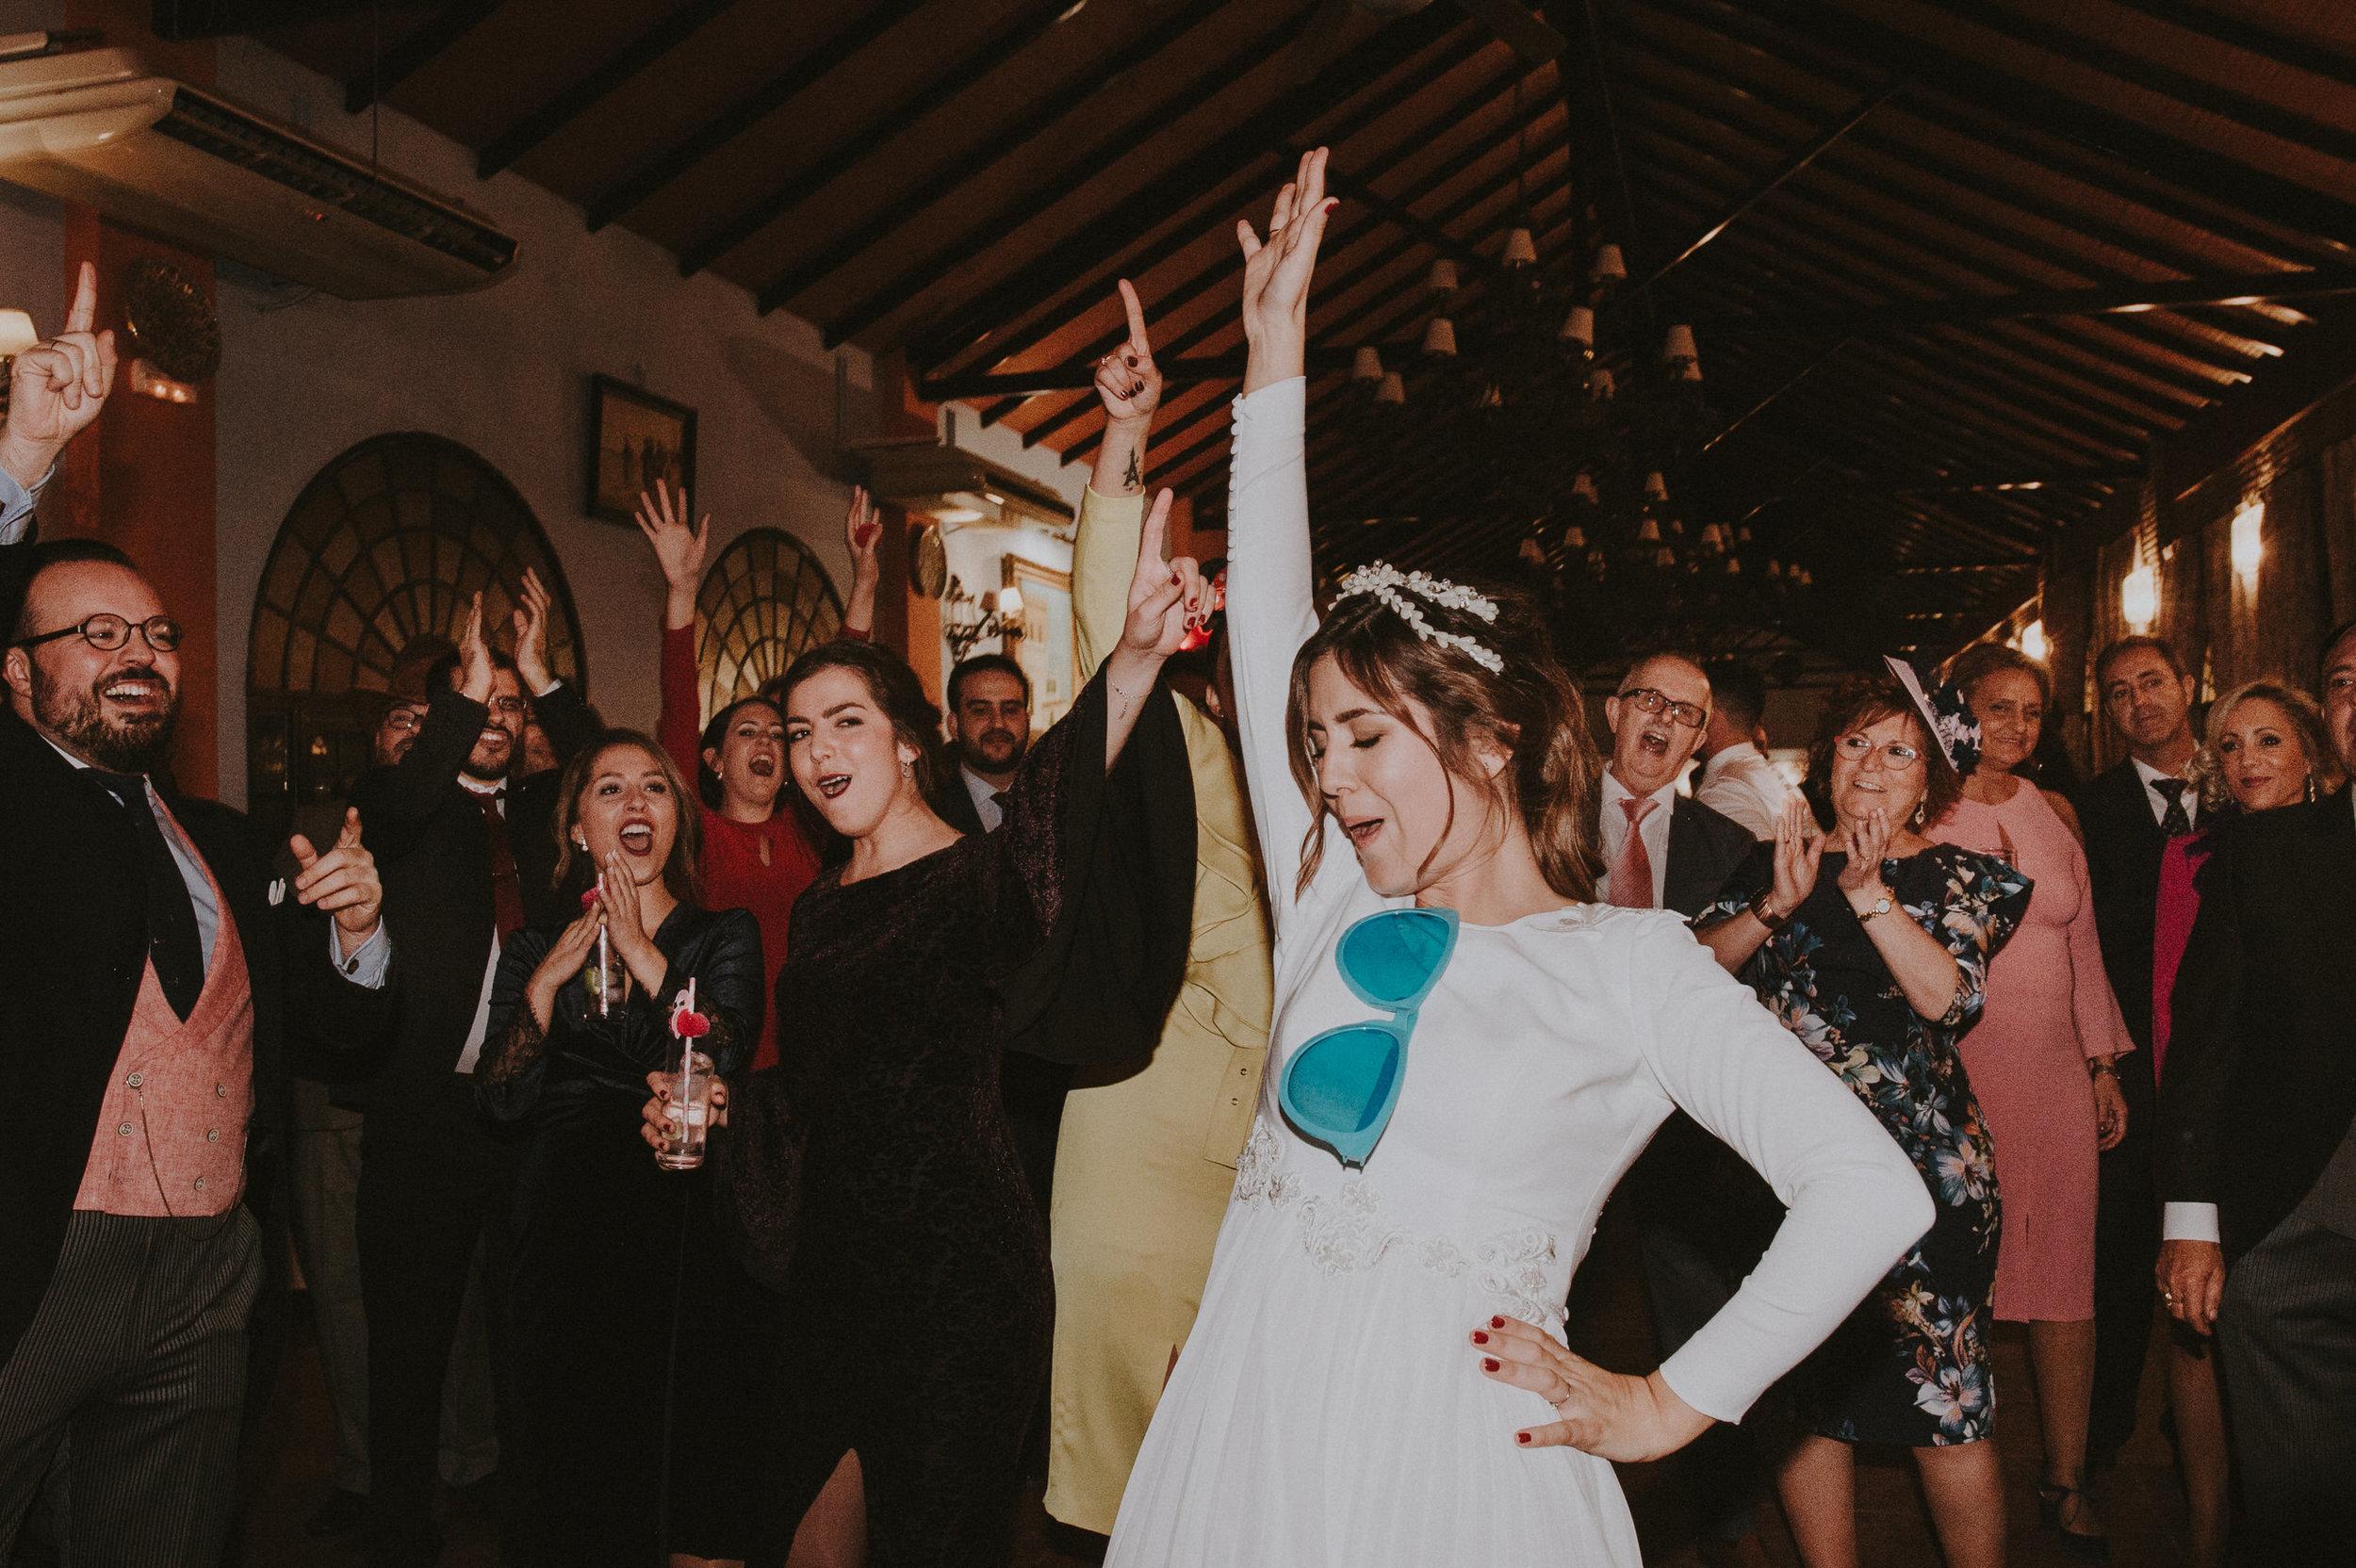 andres+amarillo+fotografo+boda+sevilla+santa+maria+de+la+blanca+al+yamanah (27).JPG